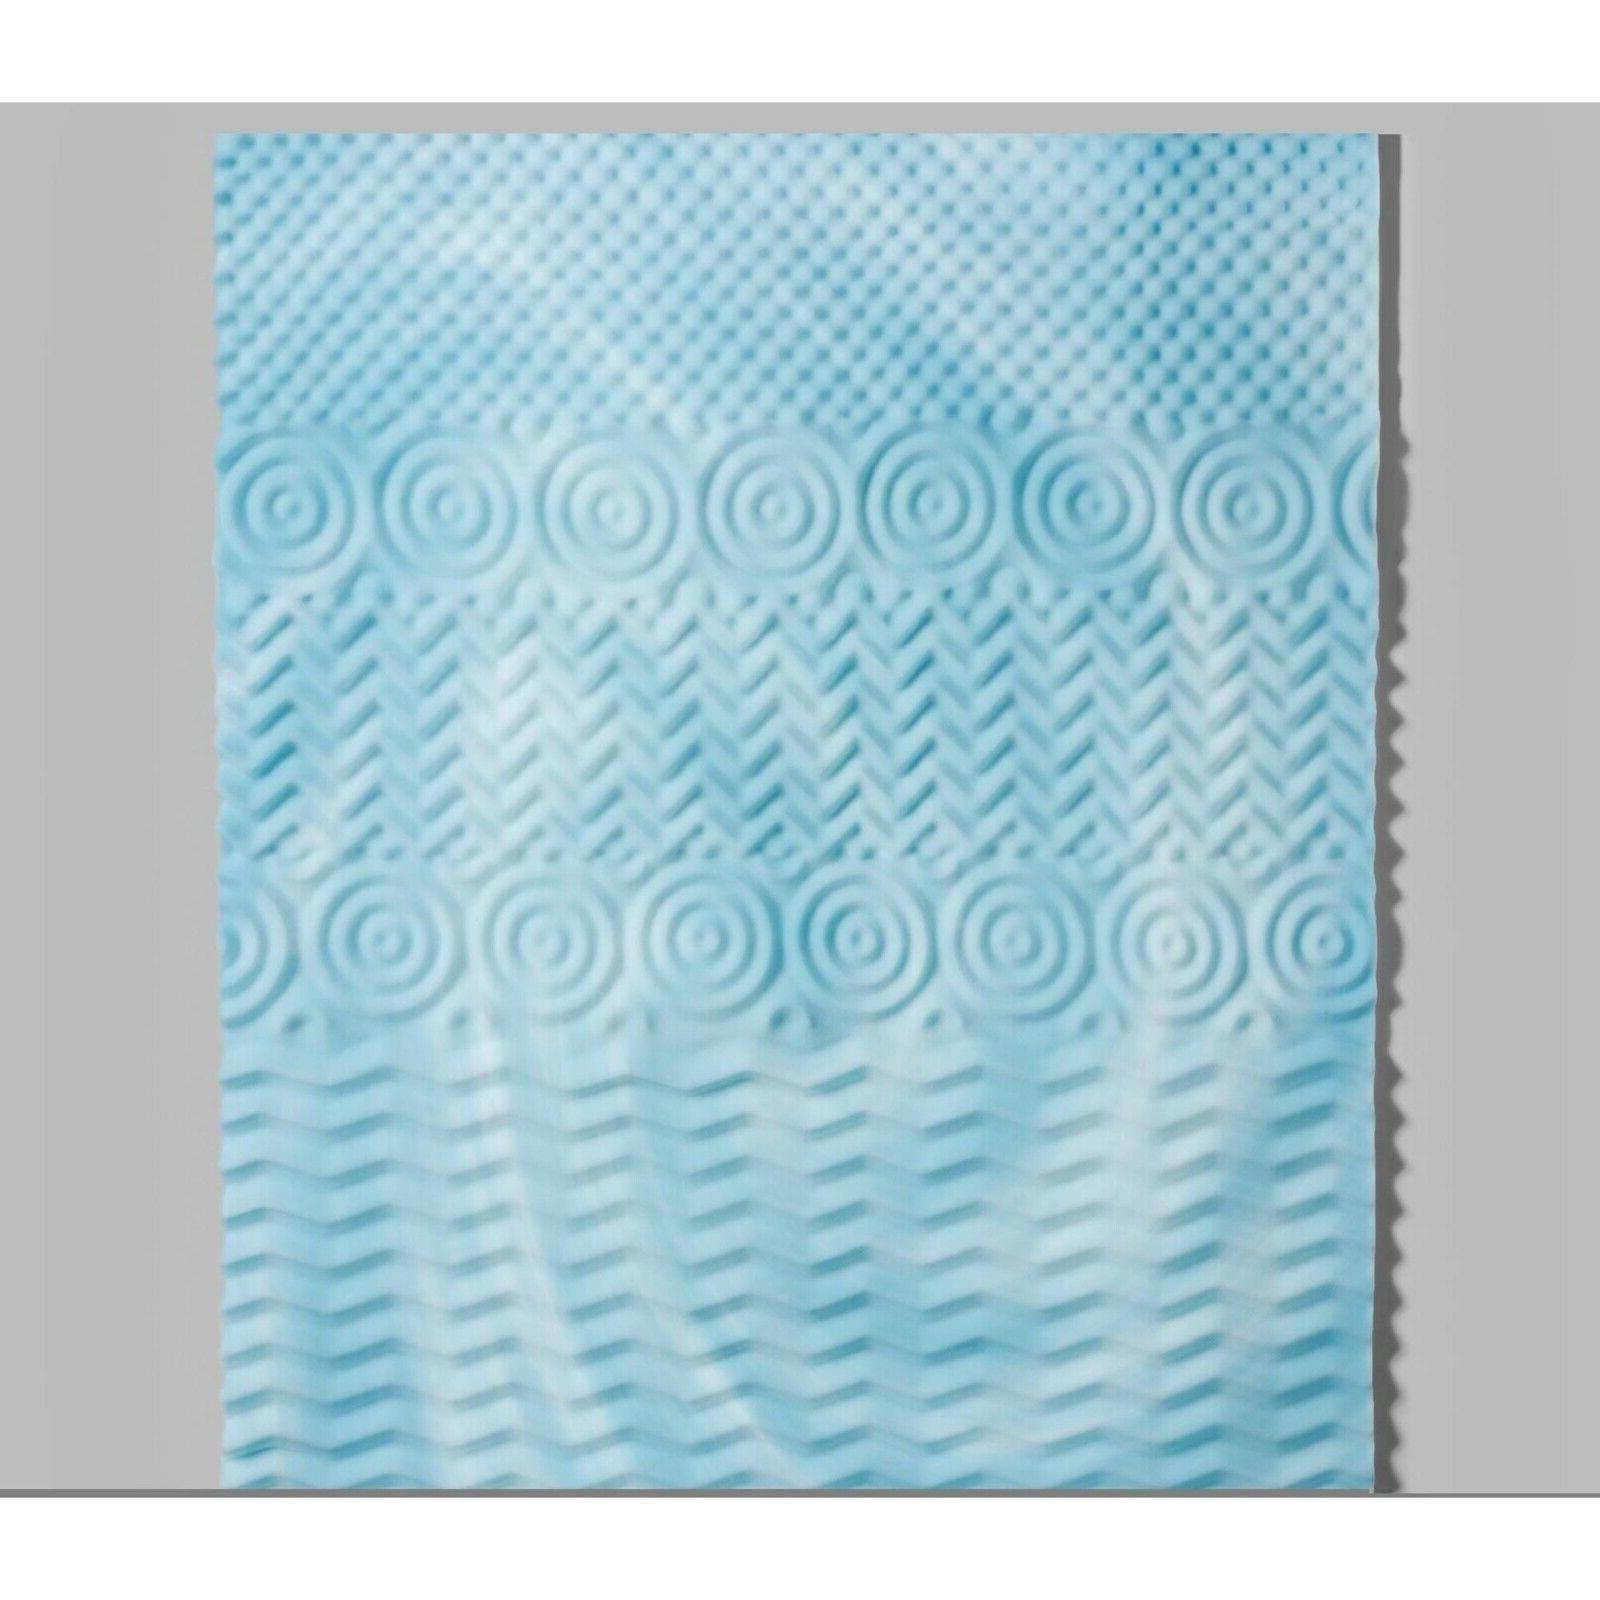 Authentic Comfort Orthopedic 5-Zone Foam Topper